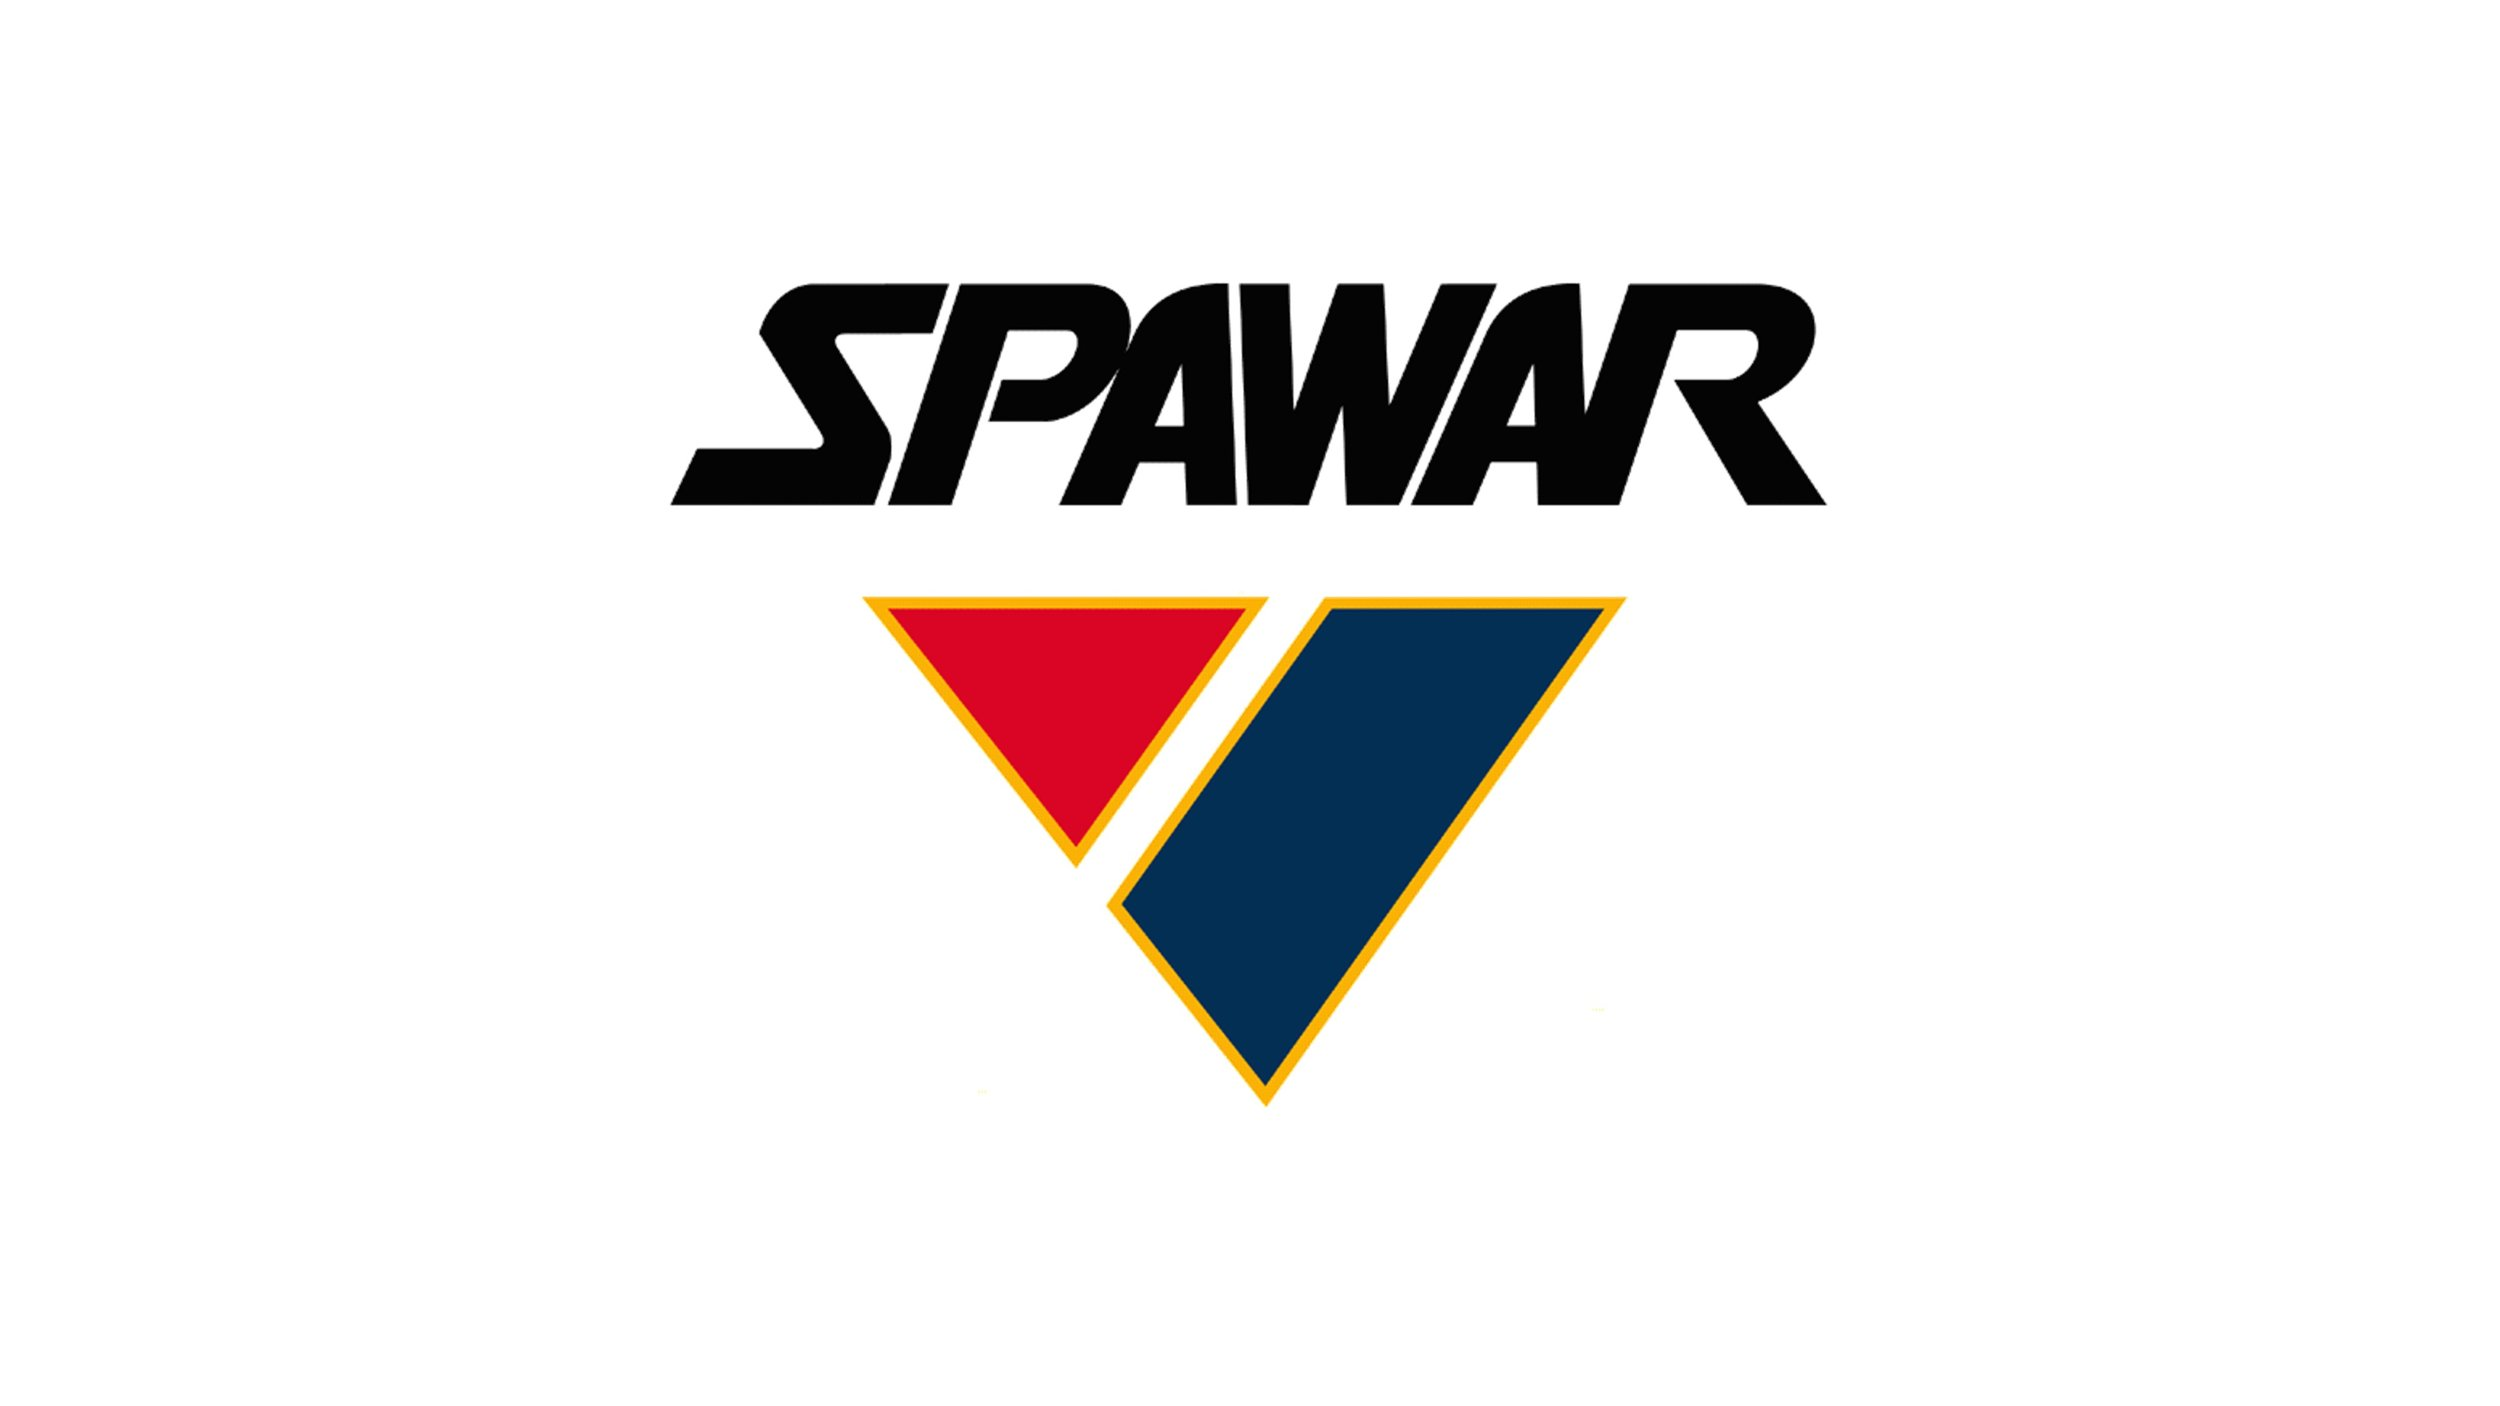 spawar2.jpg